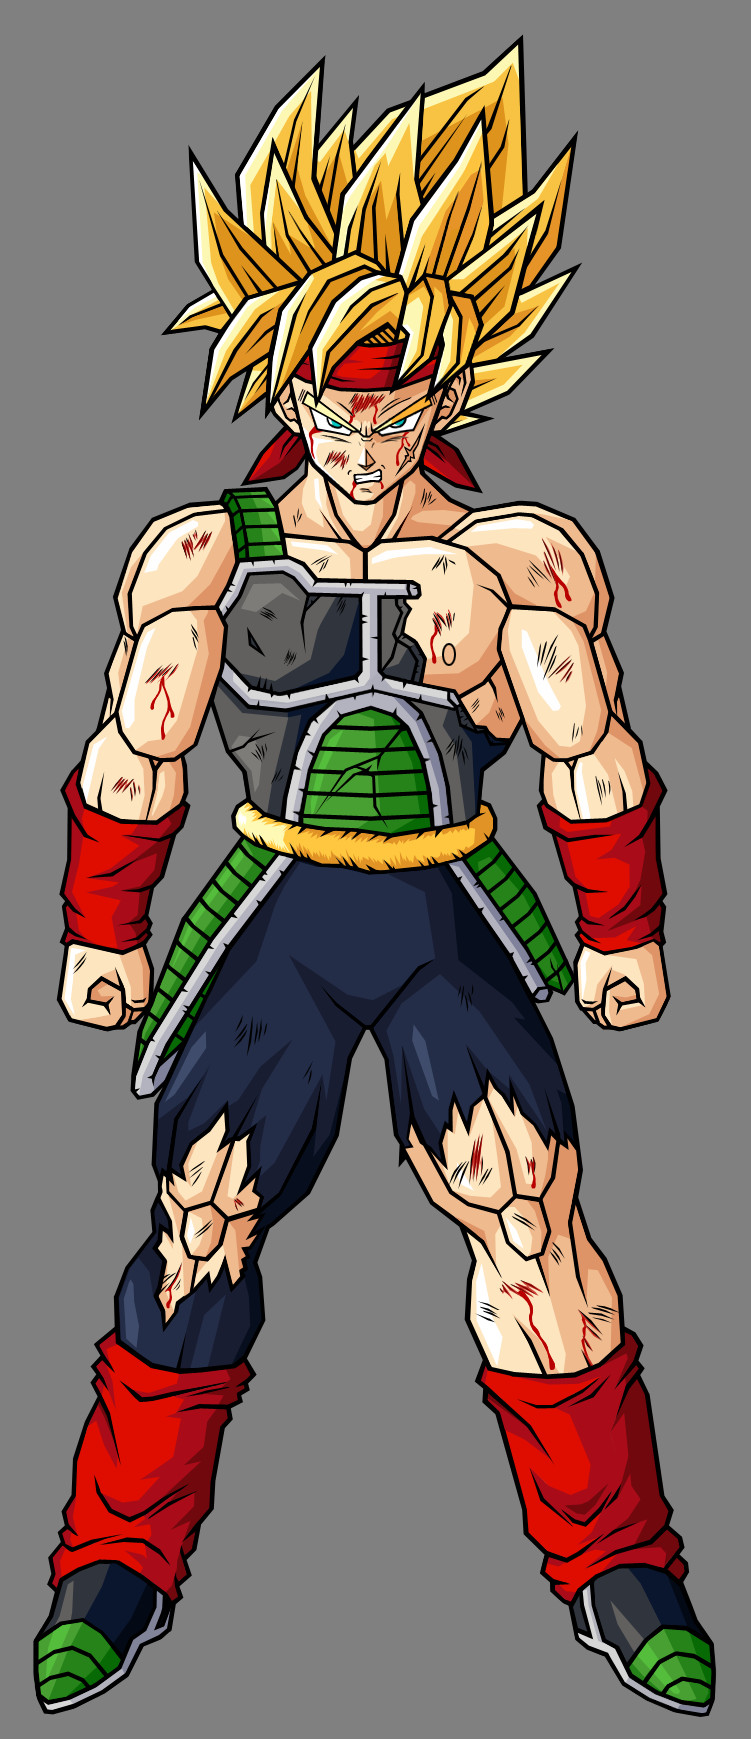 Return of Bardock: The Search for Goku